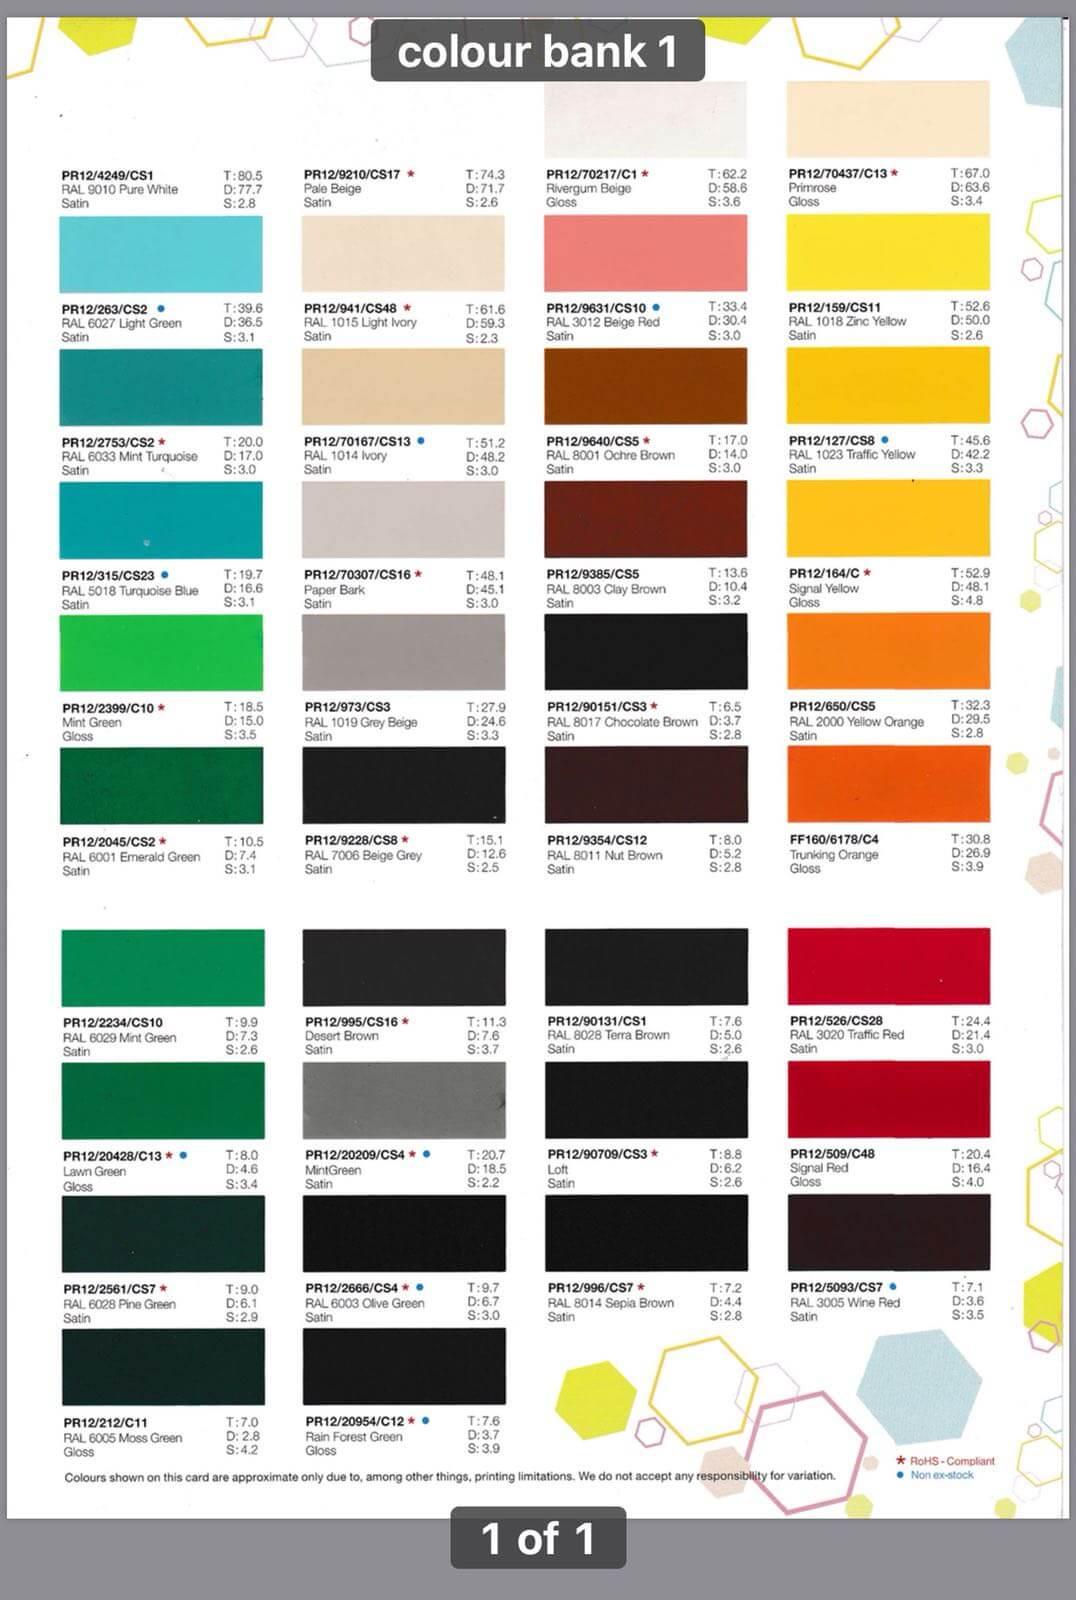 Color Bank 1